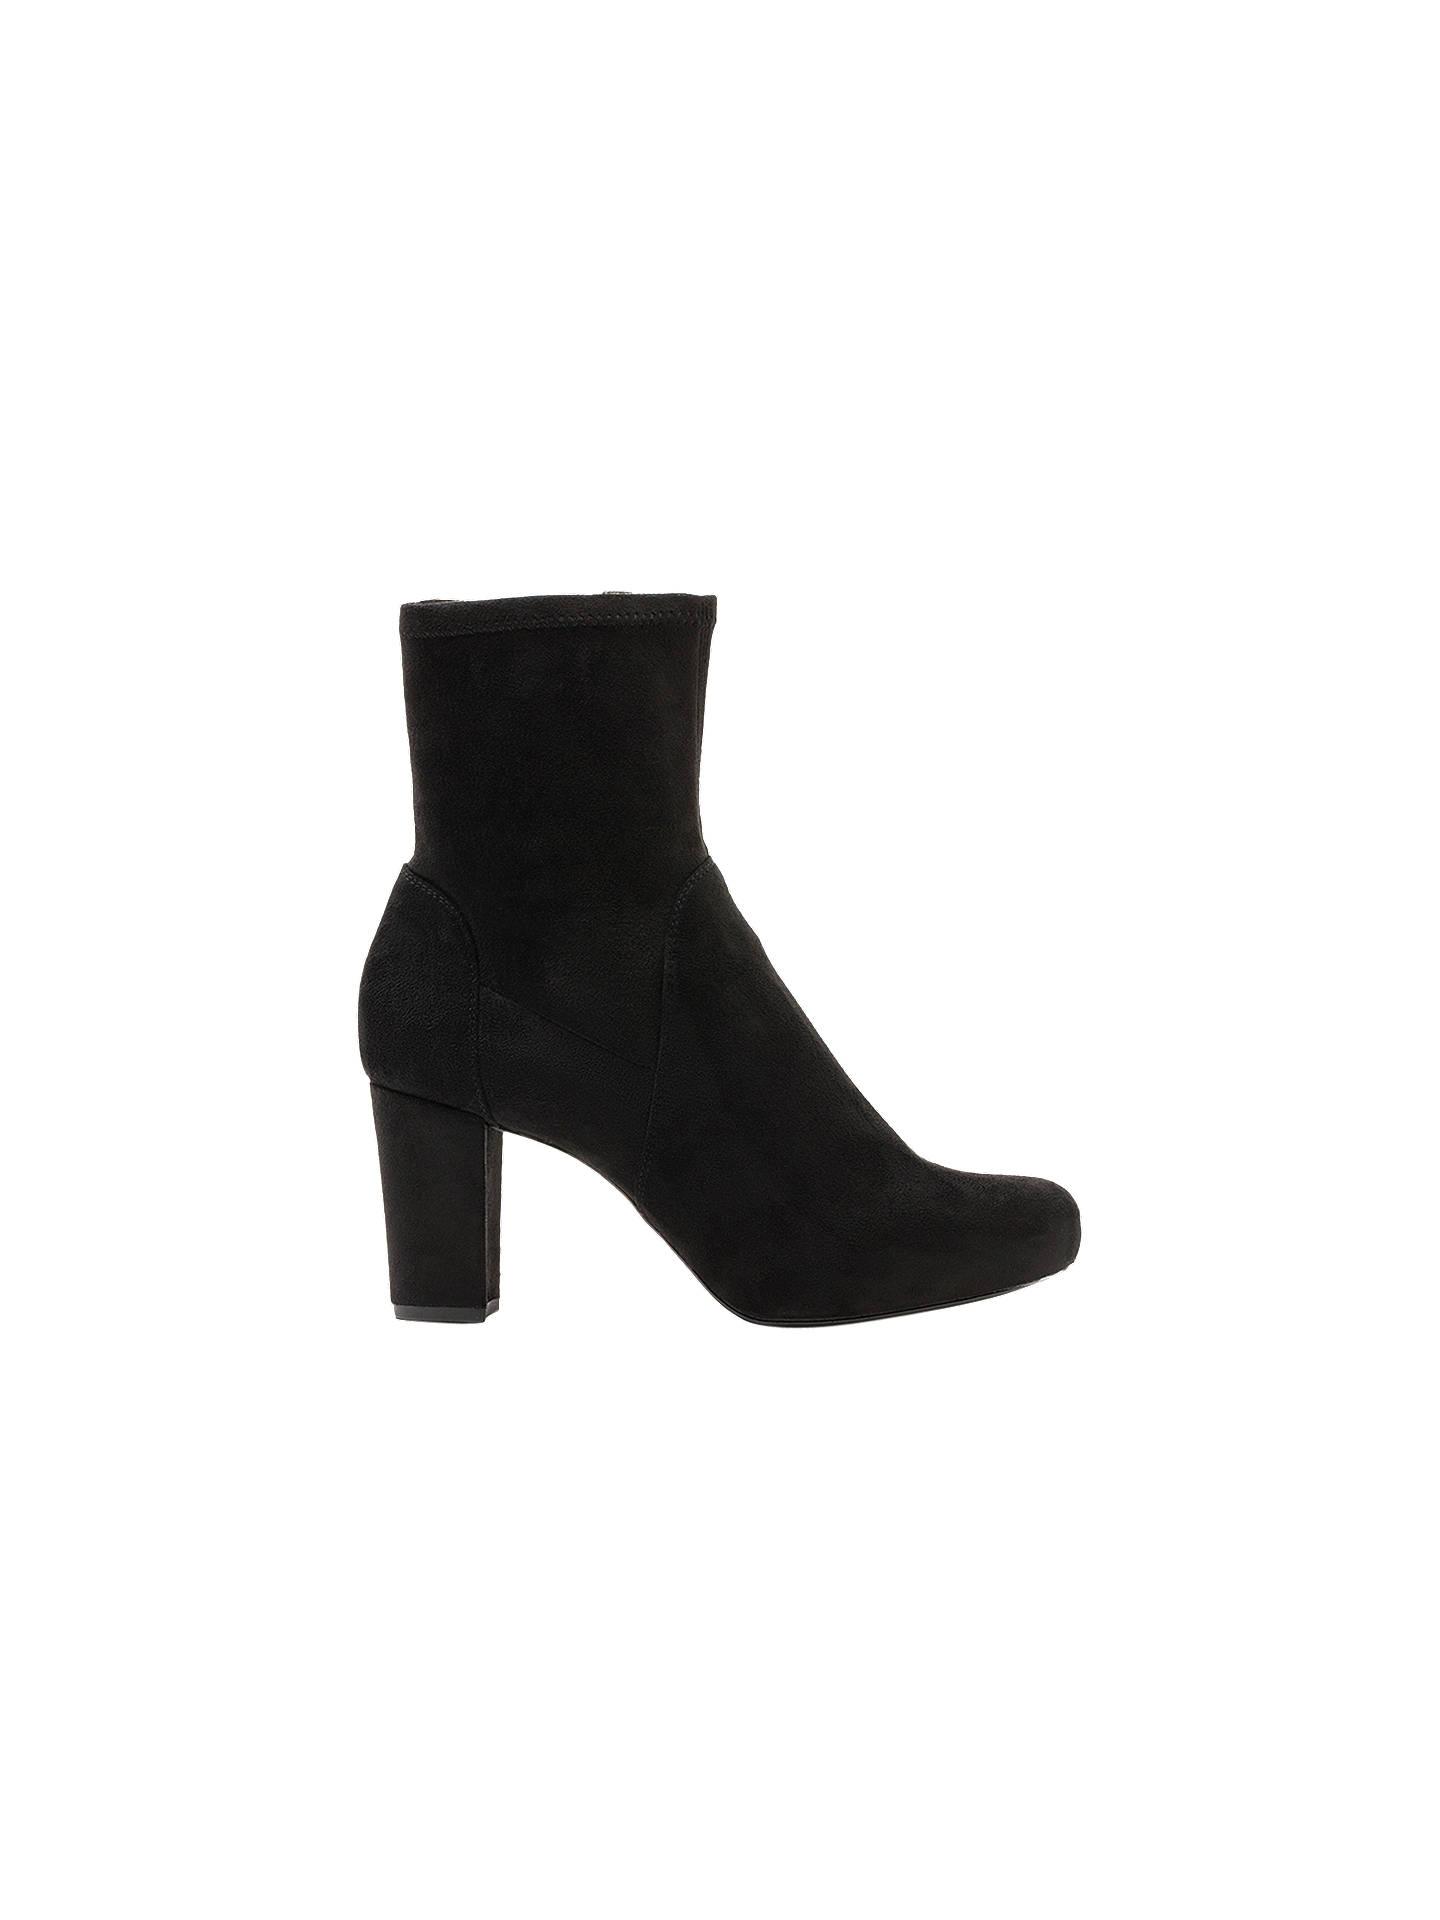 1d65e69cc Buy Unisa Nafre Block Heel Ankle Boots, Black, 4 Online at johnlewis.com ...